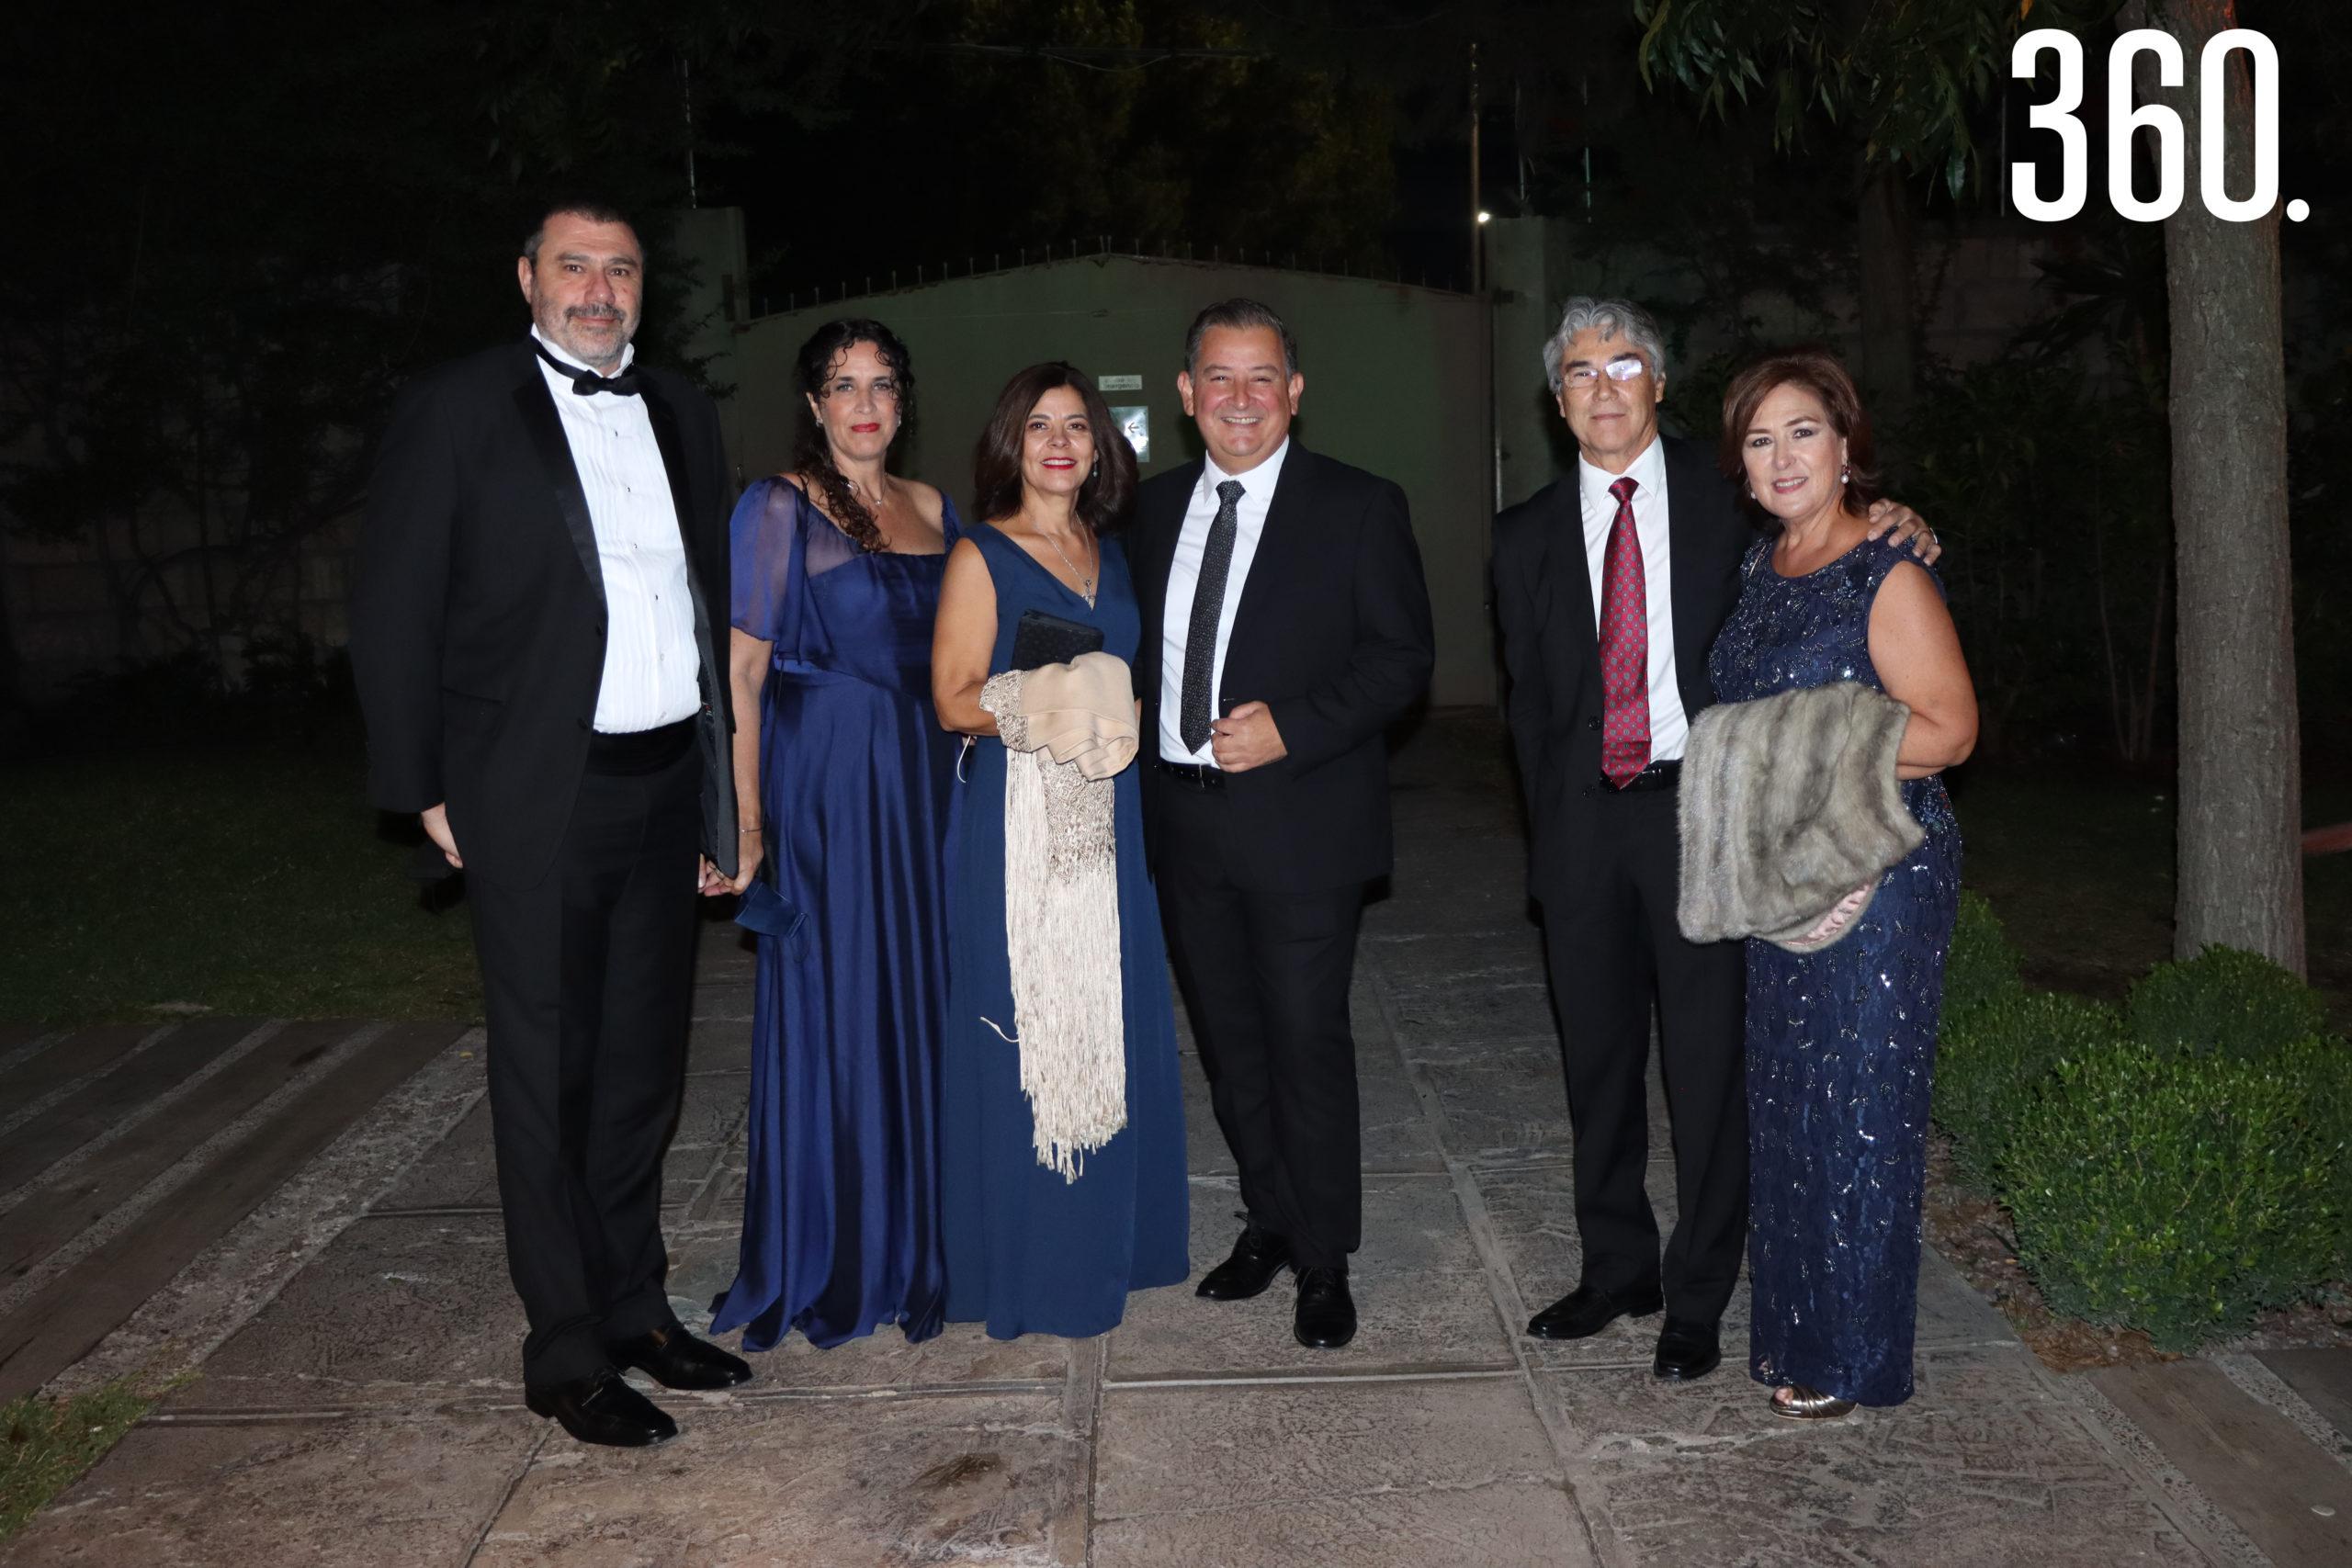 Adrián Russo, Mercedes Balsán, Martha Borrego, Juan Pablo Madero, Héctor Rodríguez y Silvia Leal.